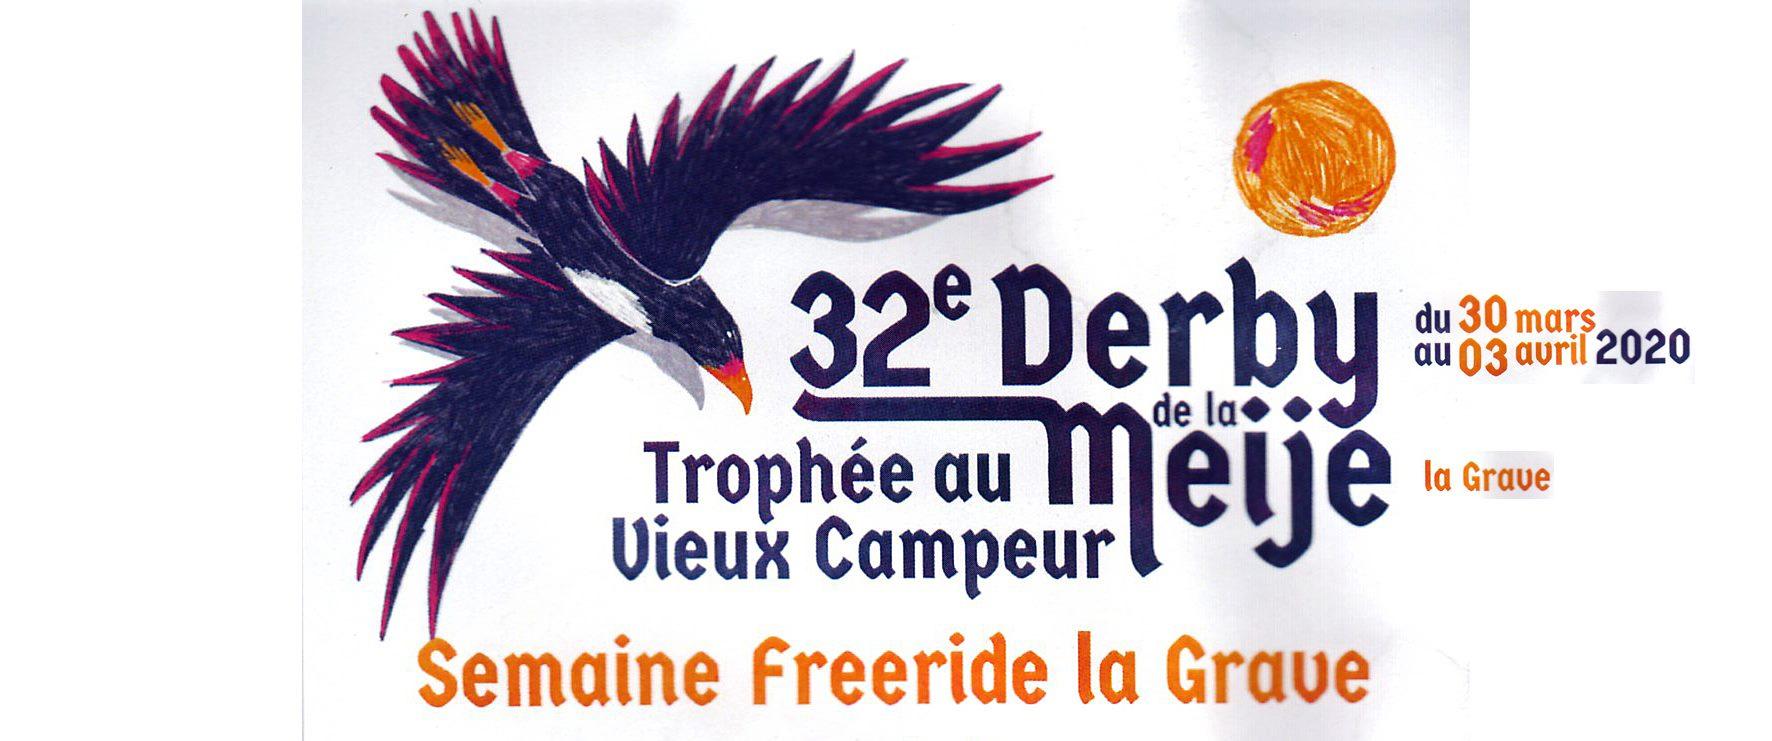 logo-32-derby.jpg